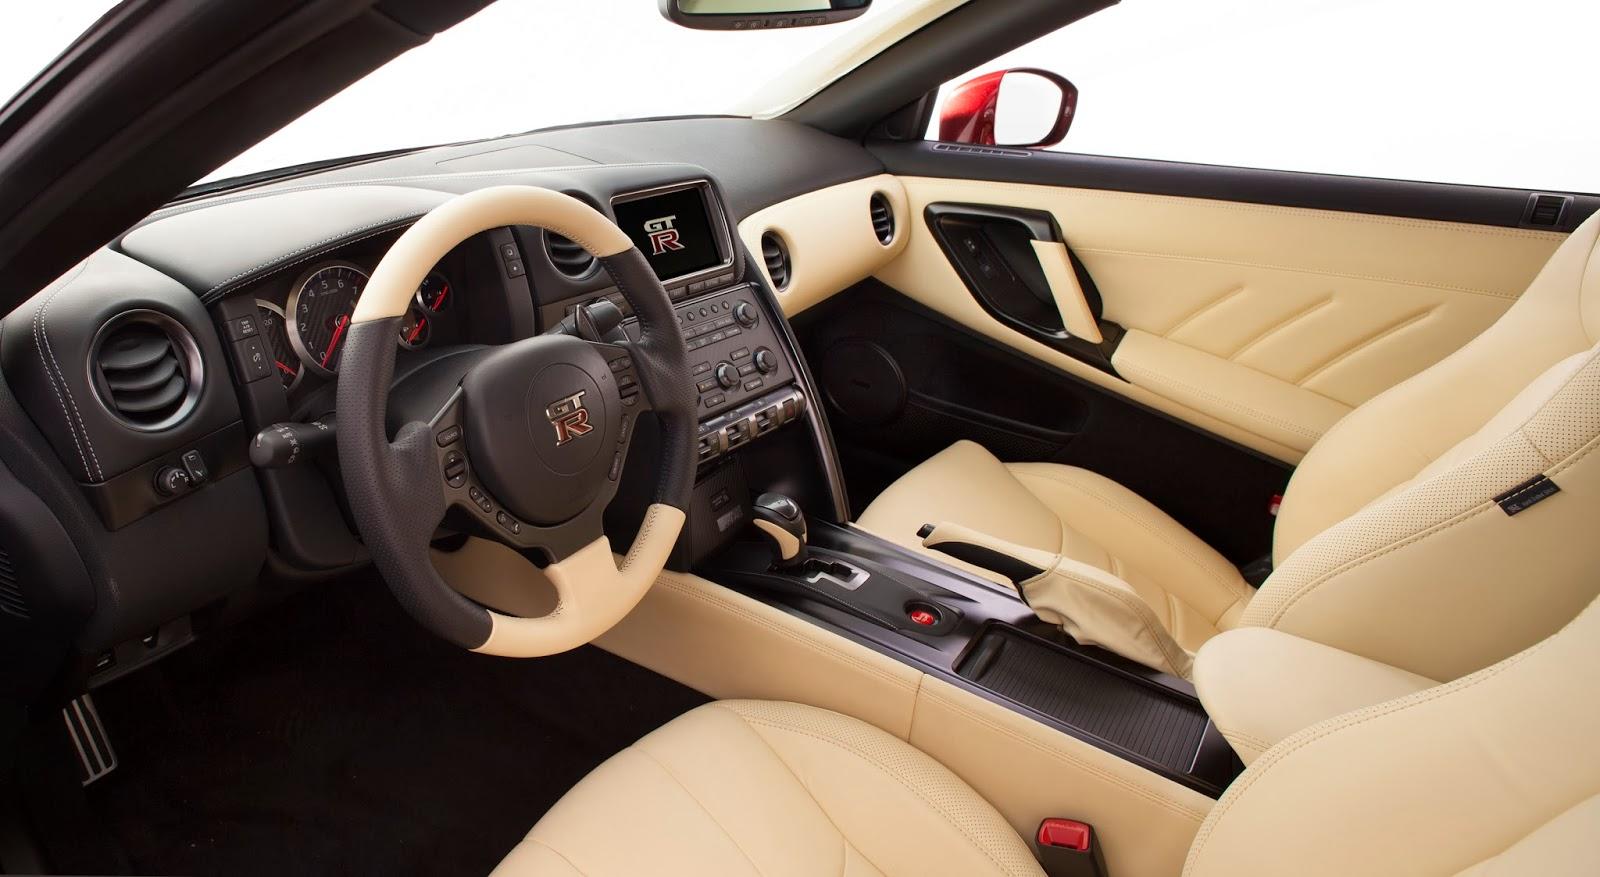 Gtrlife random gt r photo thread page 81 gt r media gt r life - Premium Ivory Interior